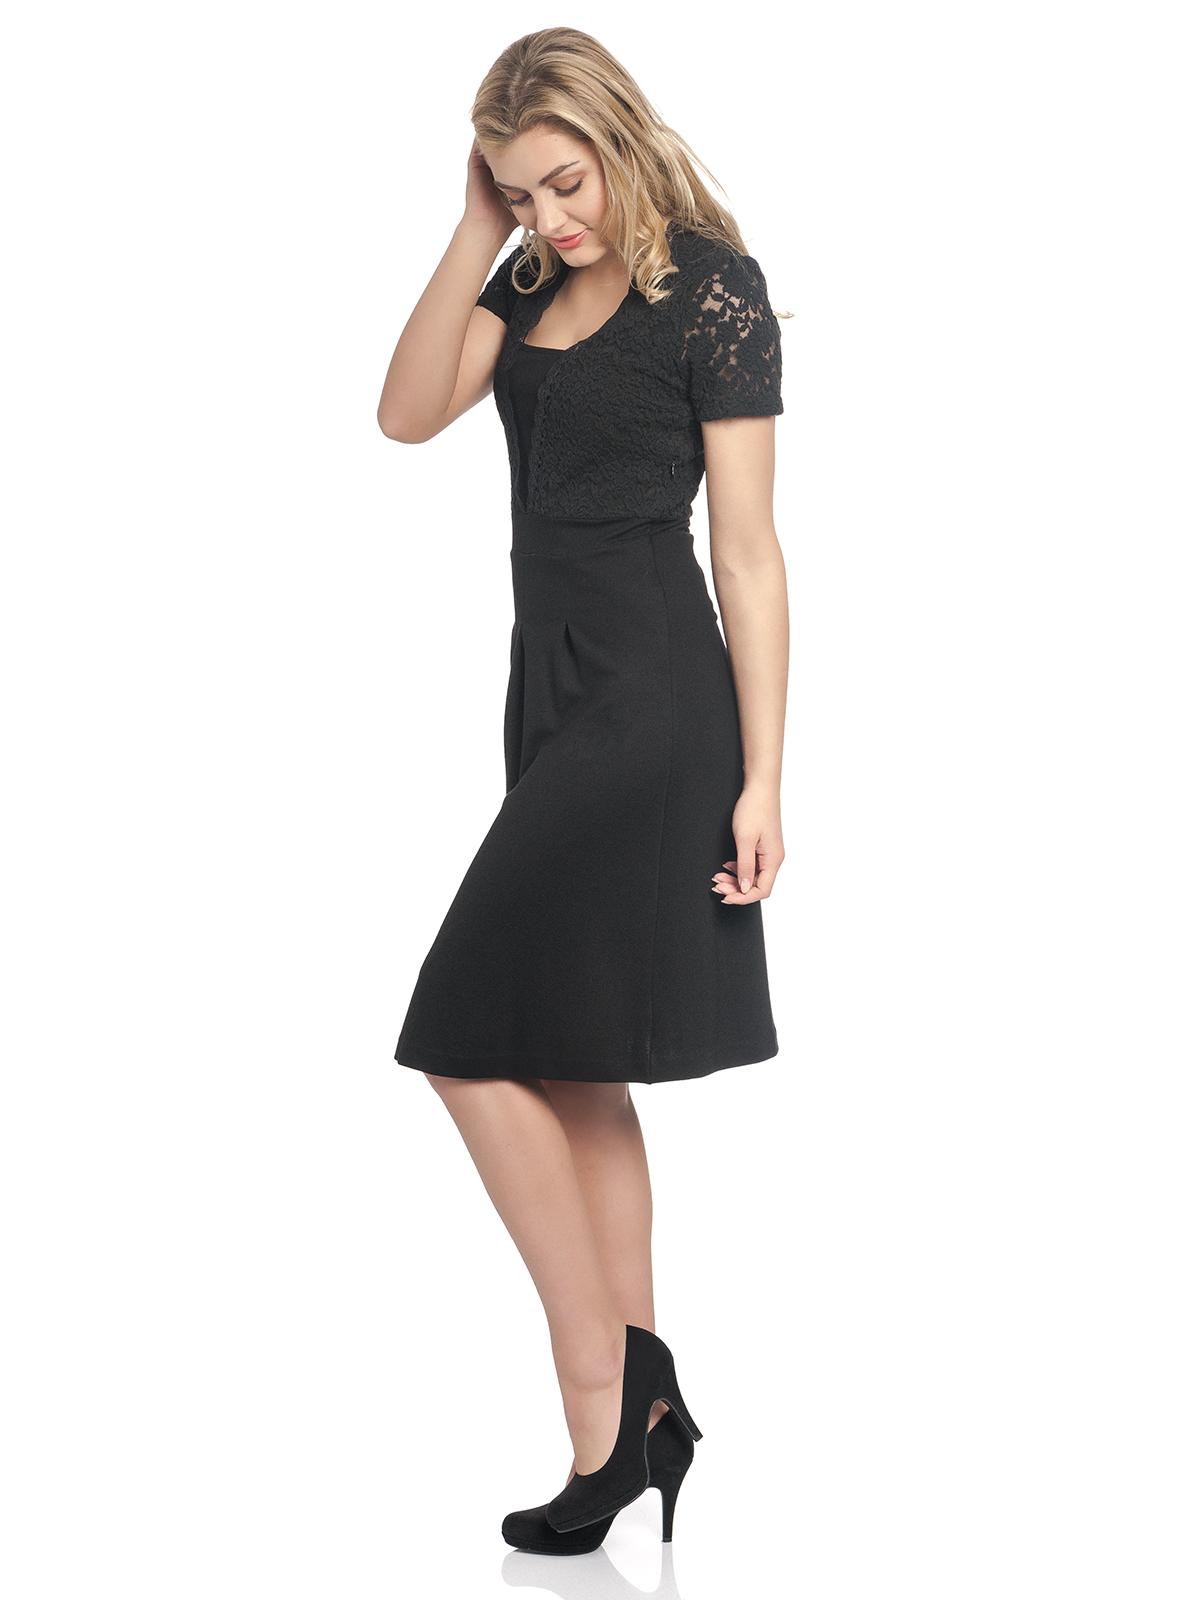 timeless design 3ea38 b6ca9 Vive Maria Party Lace Dress Black